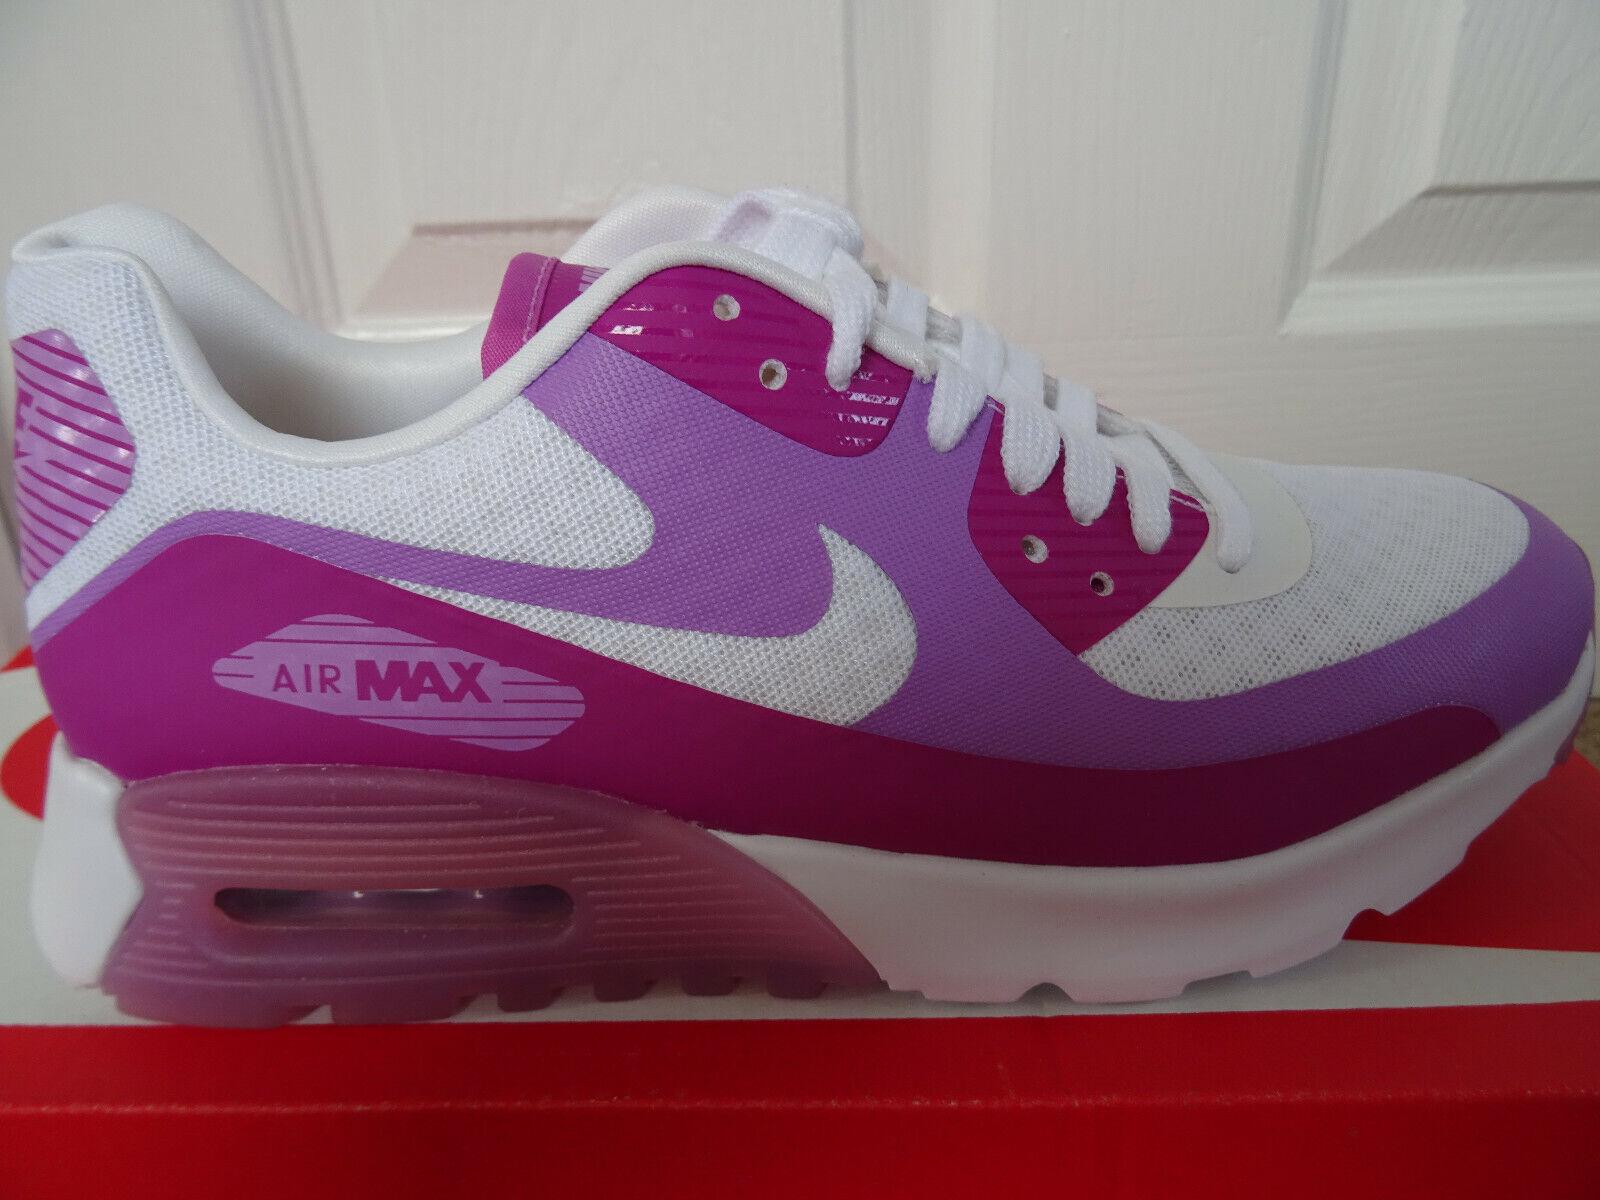 Nike Air Max 90 Ultra BR Entrenadores Para Para Para Mujer 725061 102 UK 4.5 EU 38 nos 7 Nuevo + Caja 6d843c